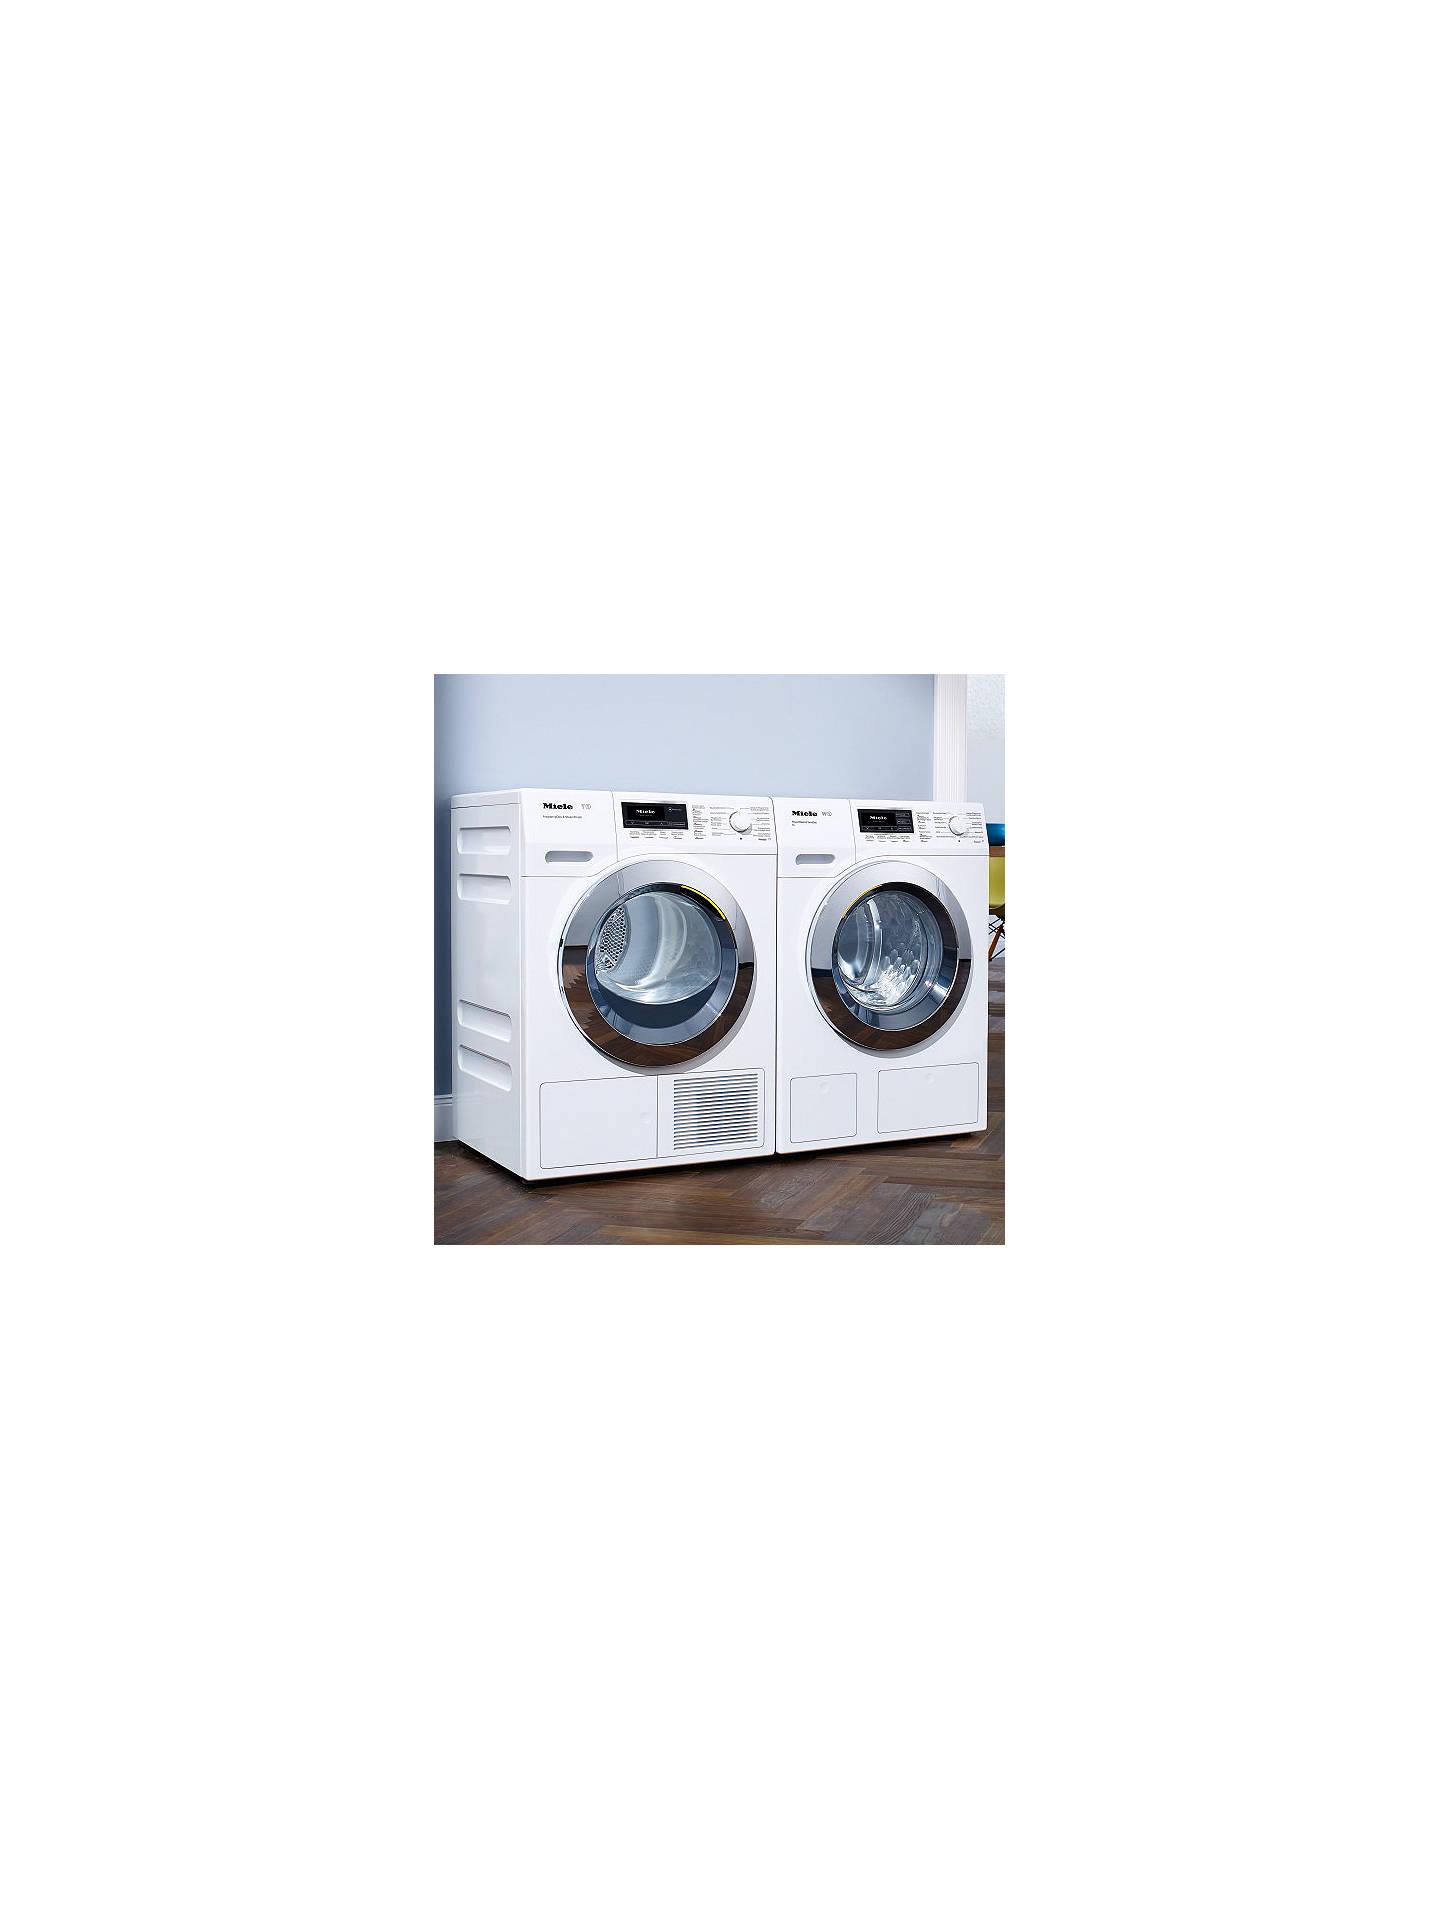 miele wkh 120 wps freestanding washing machine 8kg load. Black Bedroom Furniture Sets. Home Design Ideas